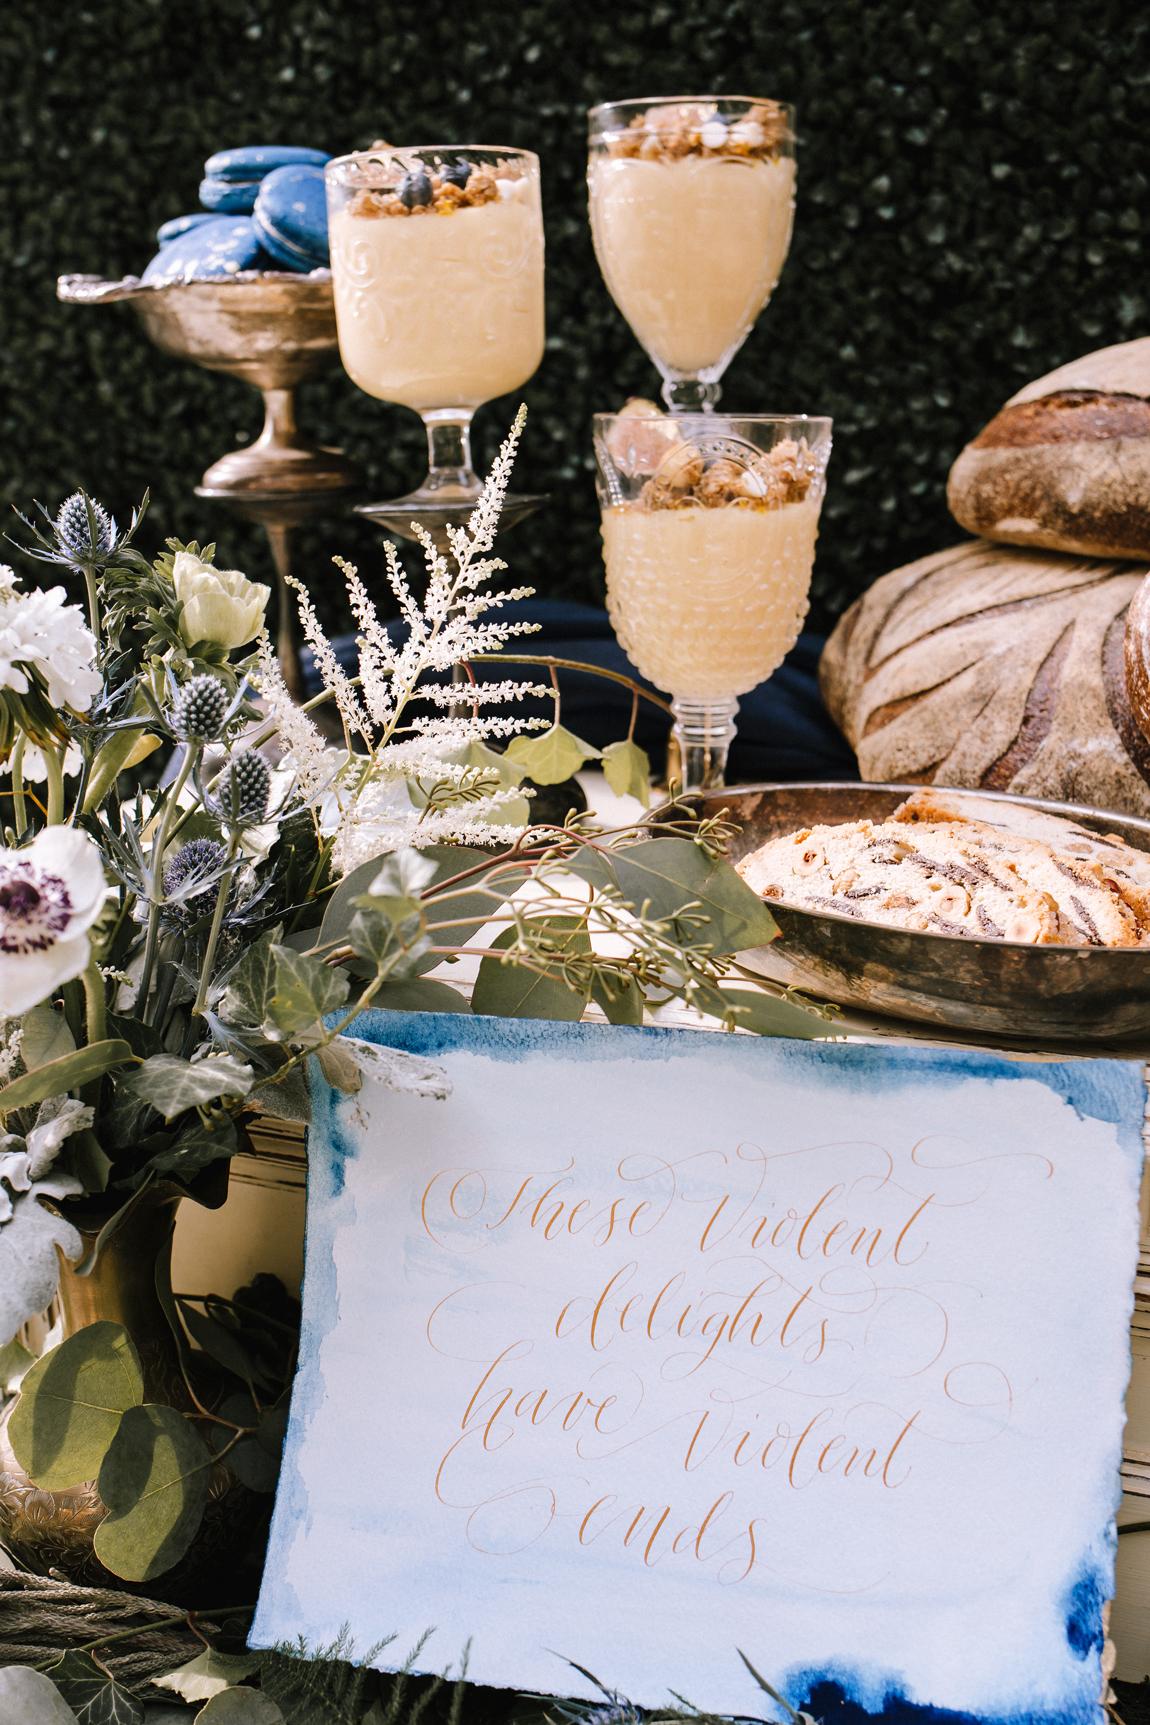 Romeo and Juliet inspired wedding decor